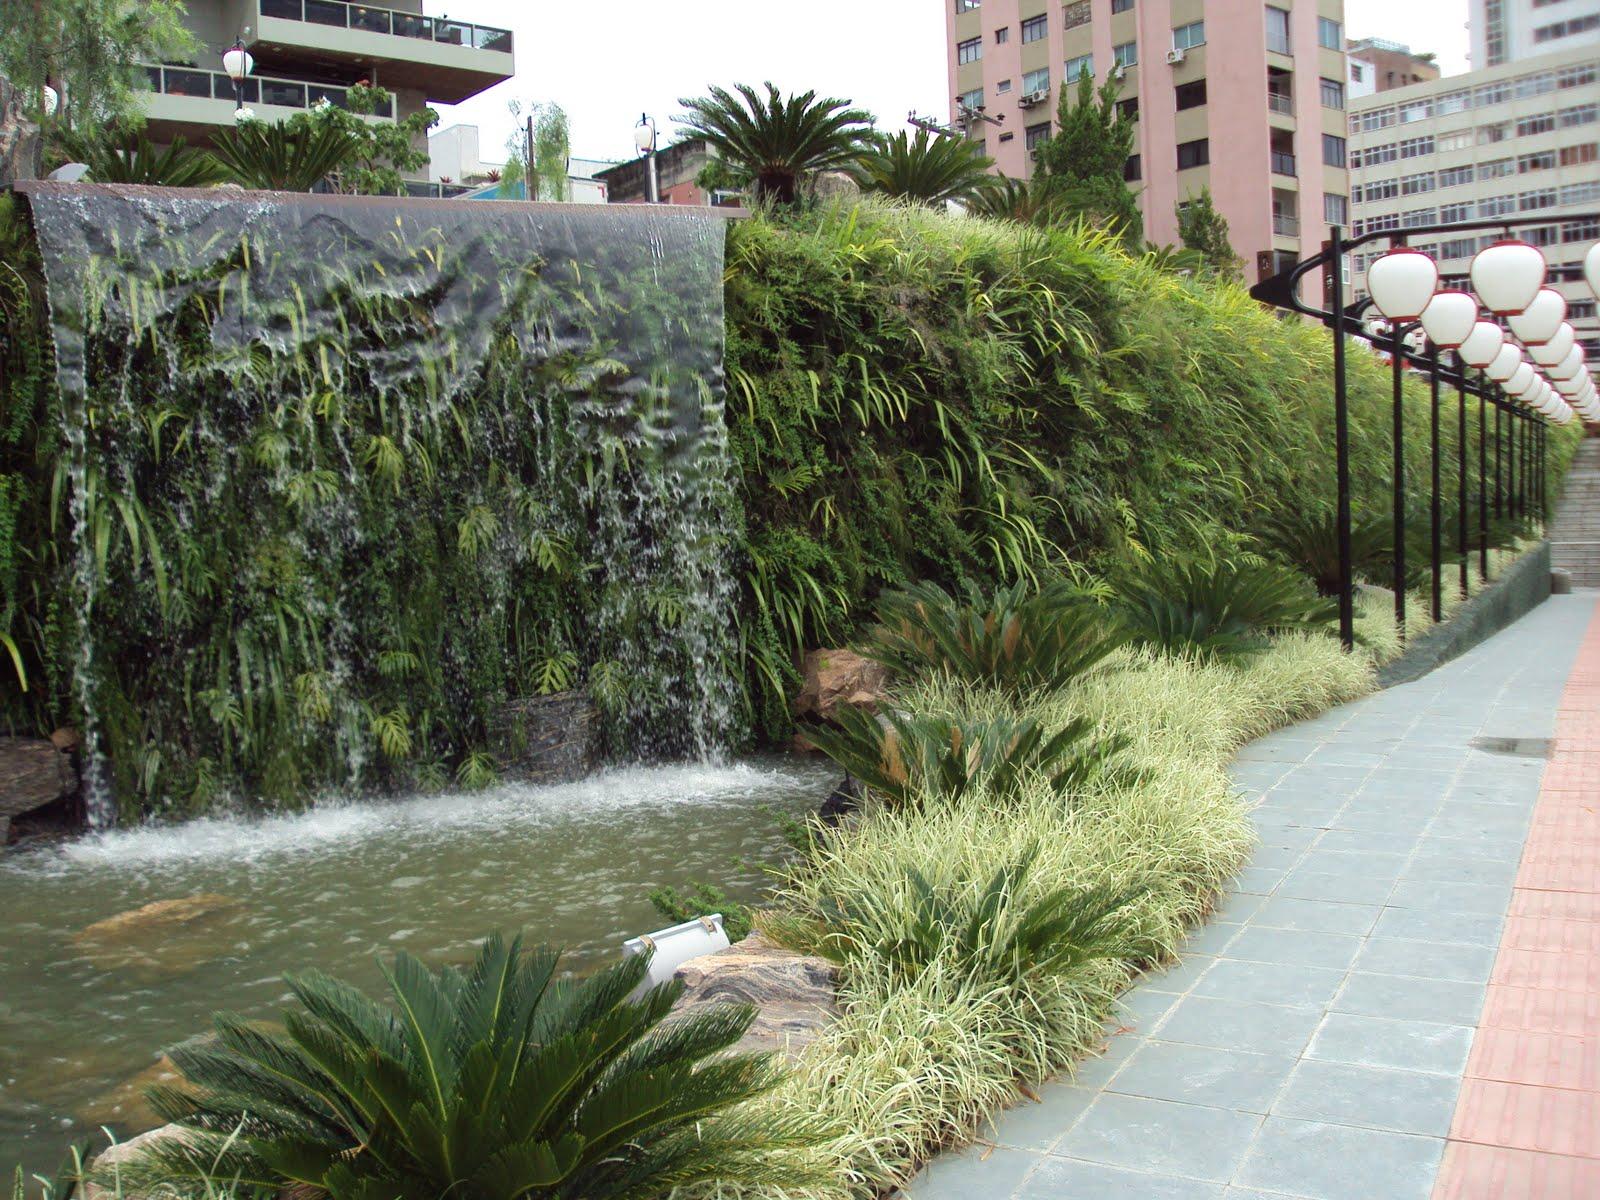 imagens jardim japones : imagens jardim japones:É nossa a praça!: Praça Jardim Japonês